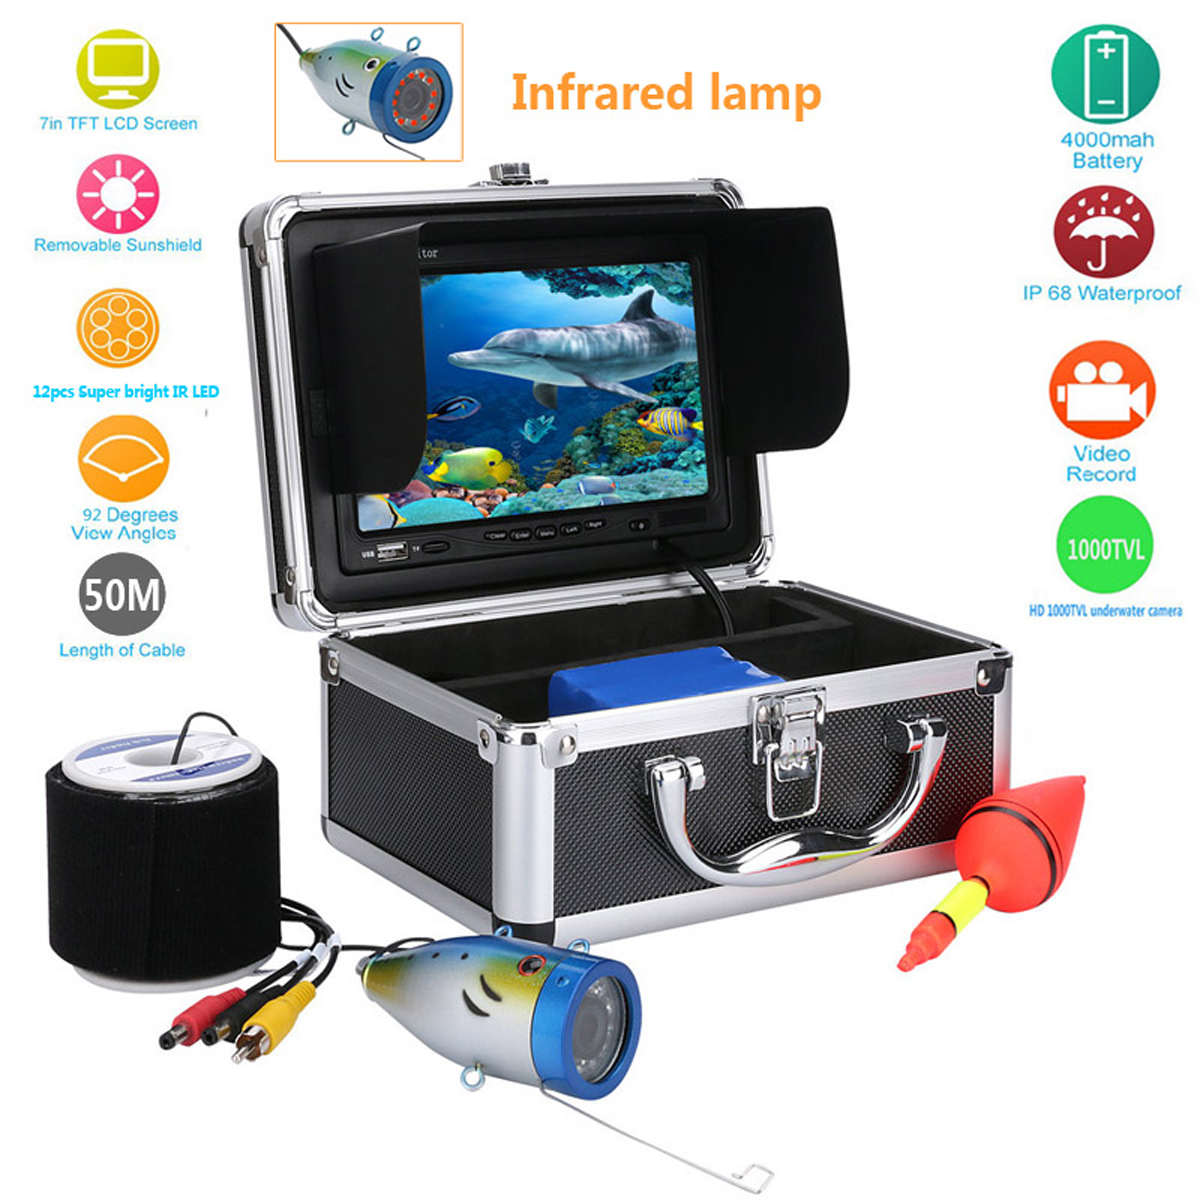 50M/164FT 7'' TFT LCD Screen Underwater Video Camera Fish...